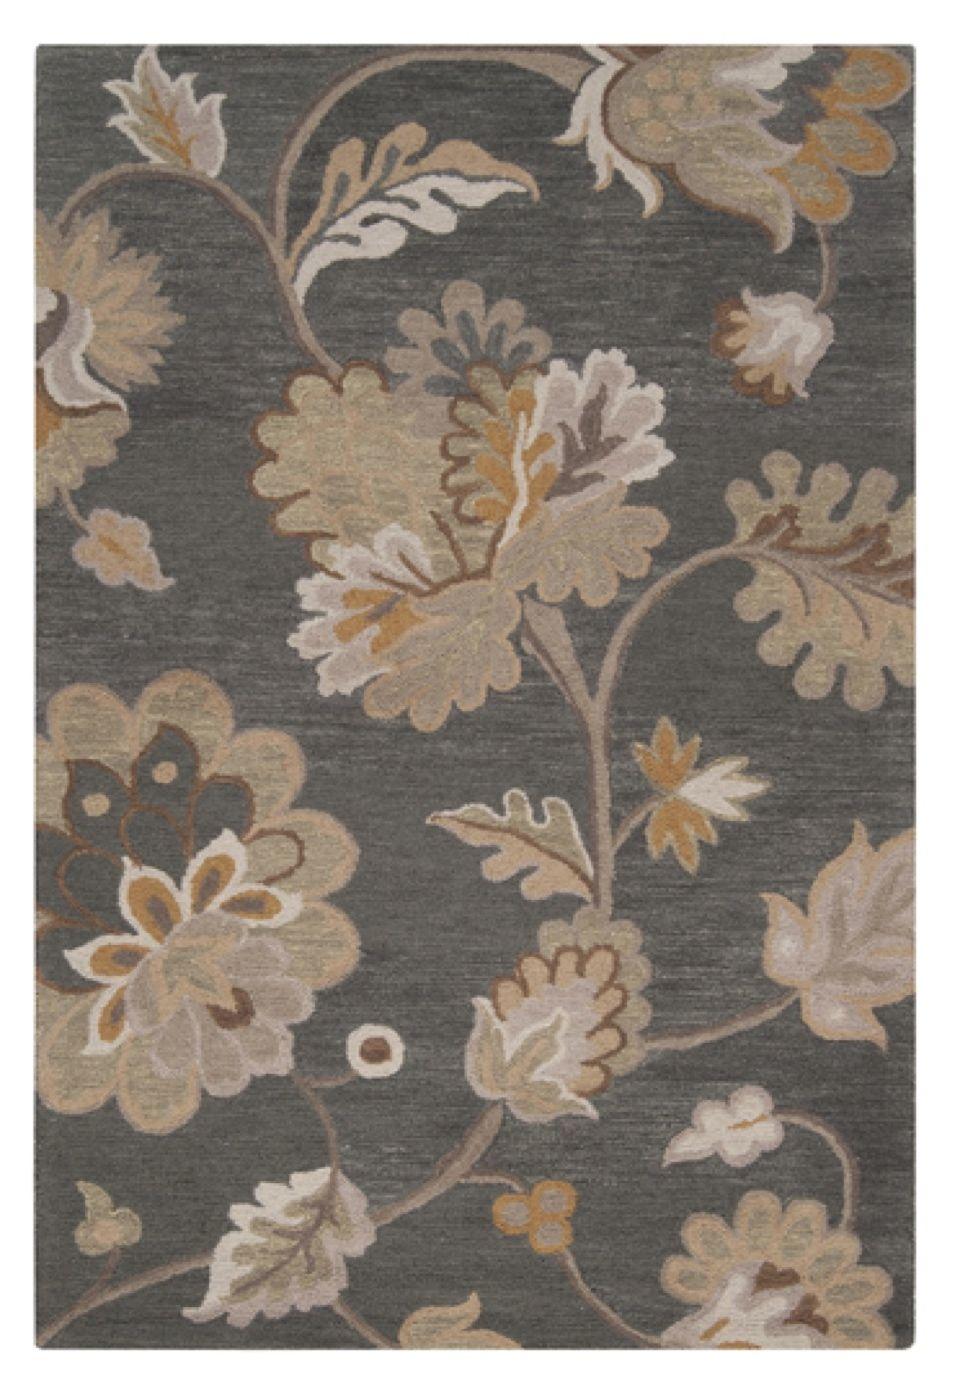 Gray Tan Transitional Style Multiroom Design Part I Wool